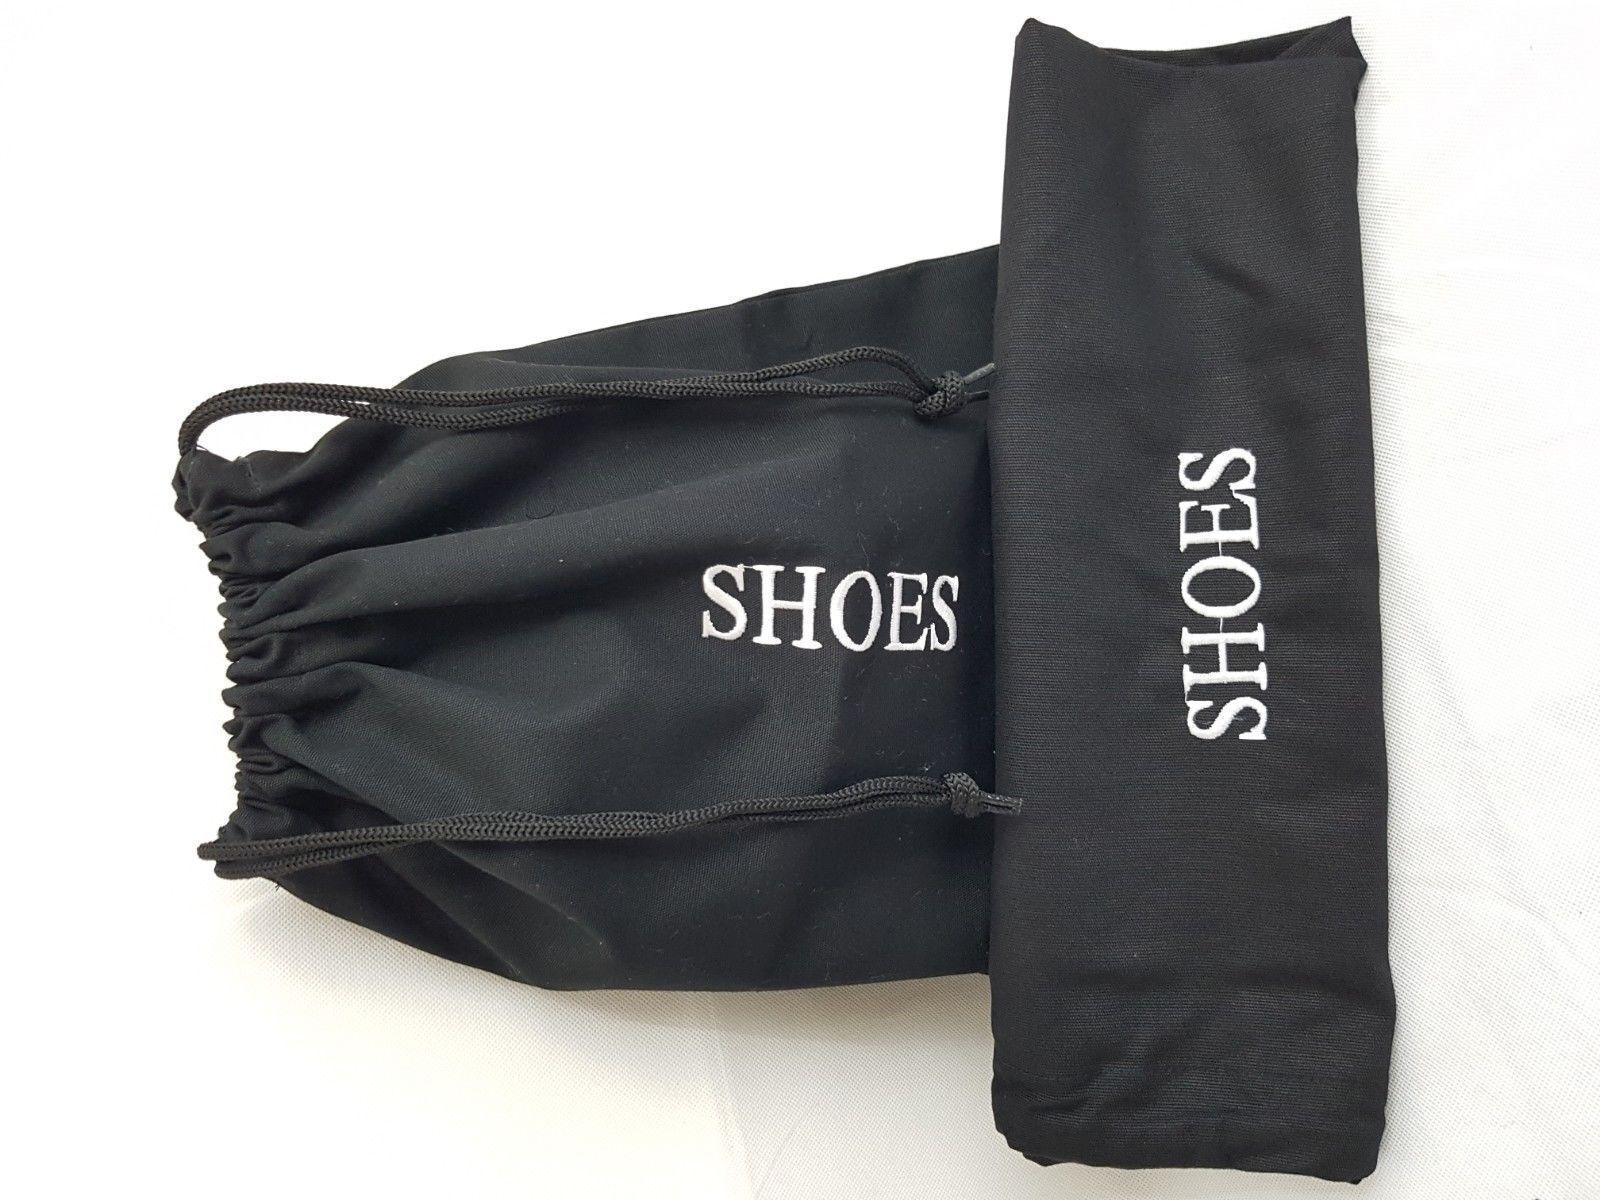 5pcs coton Sèche-cheveux Sac de rangement brodé pour Bagage Voyage Sèche-cheveux sac